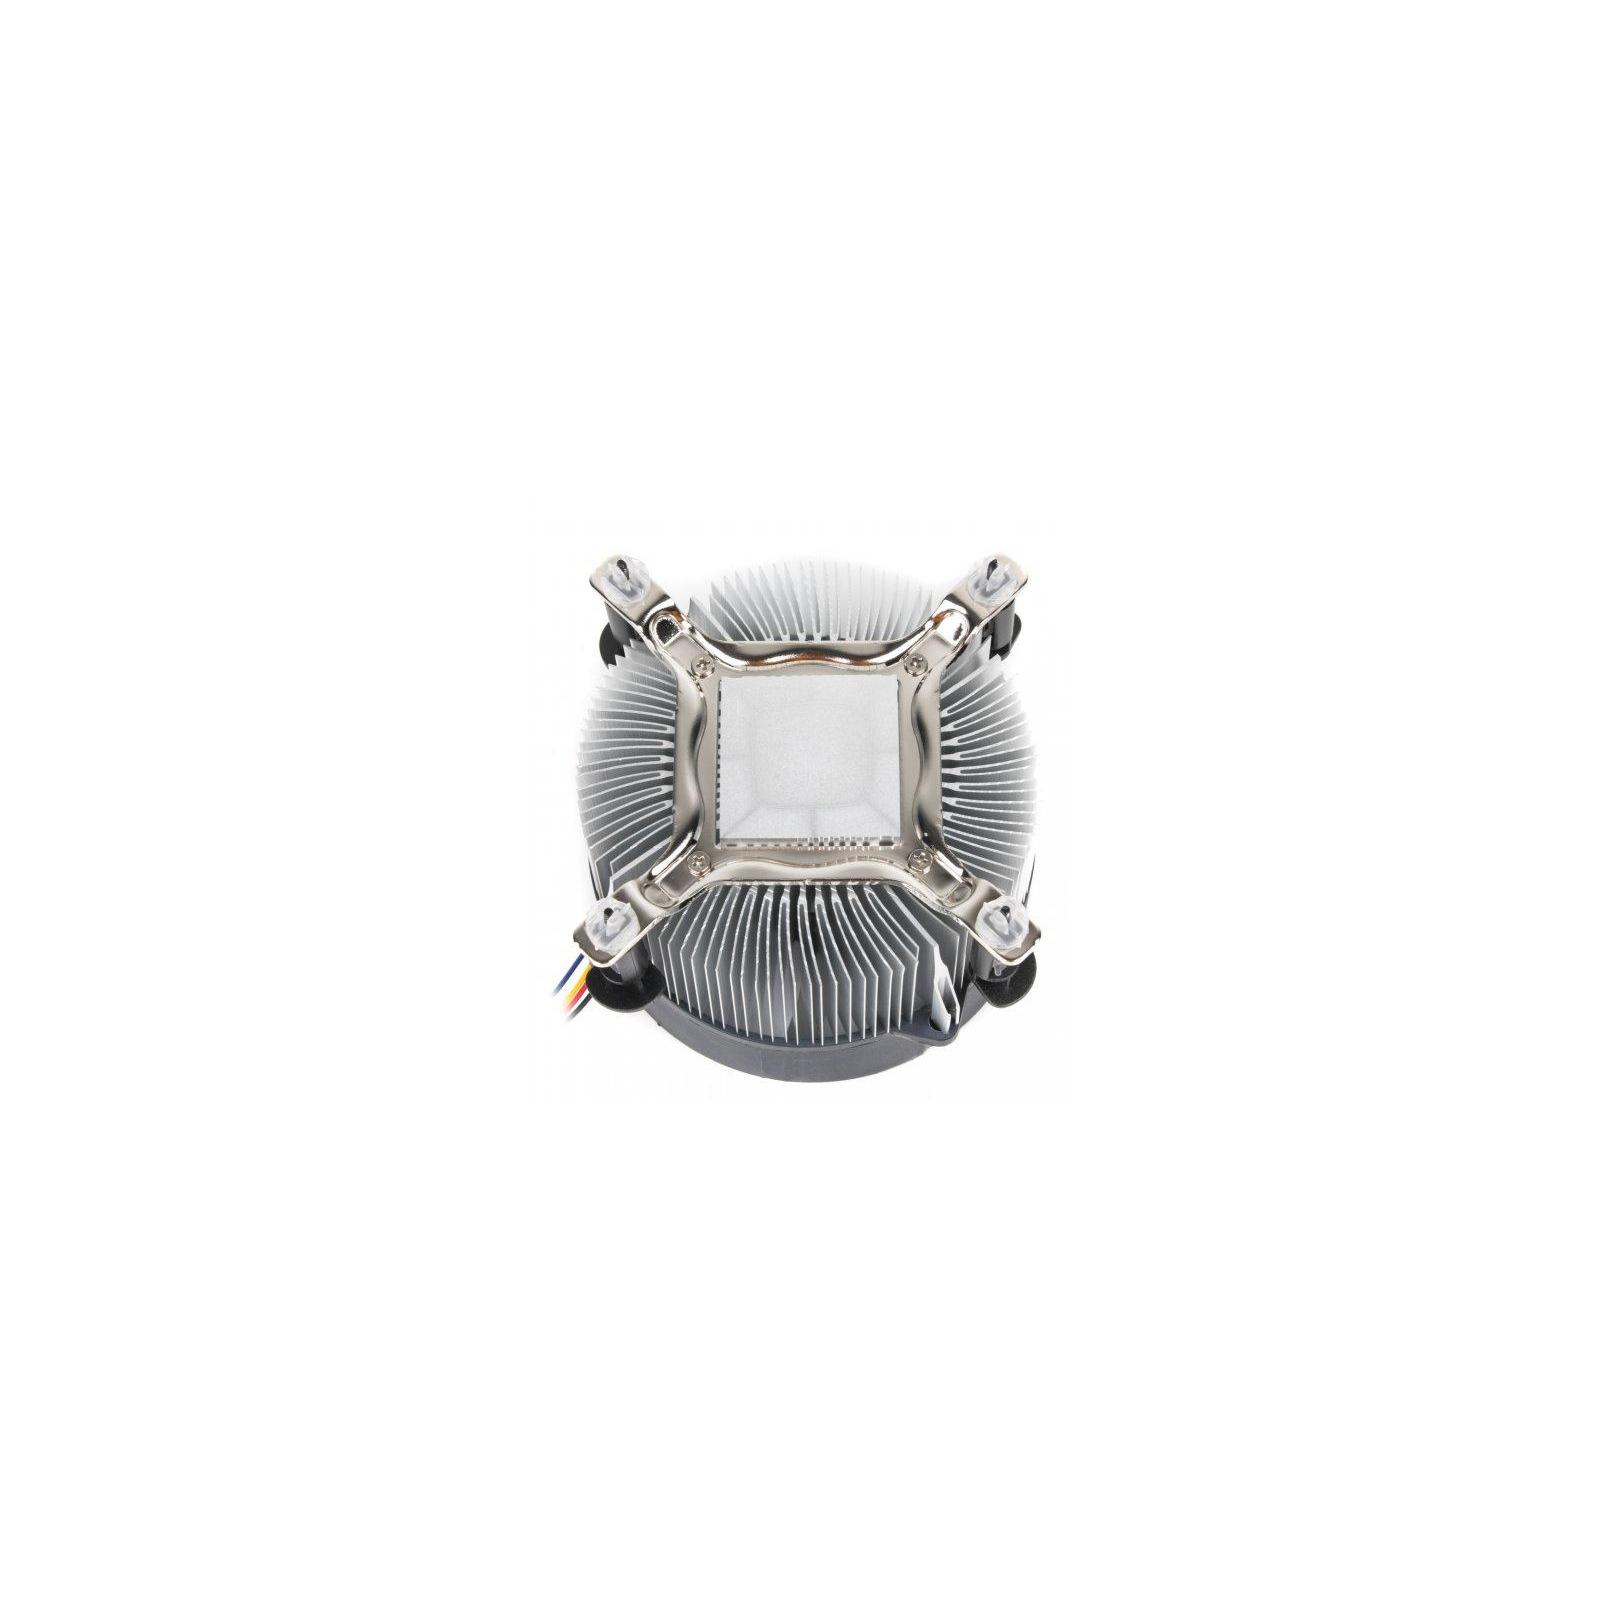 Кулер для процессора Titan TTC-NA02TZ/RPW1 изображение 2